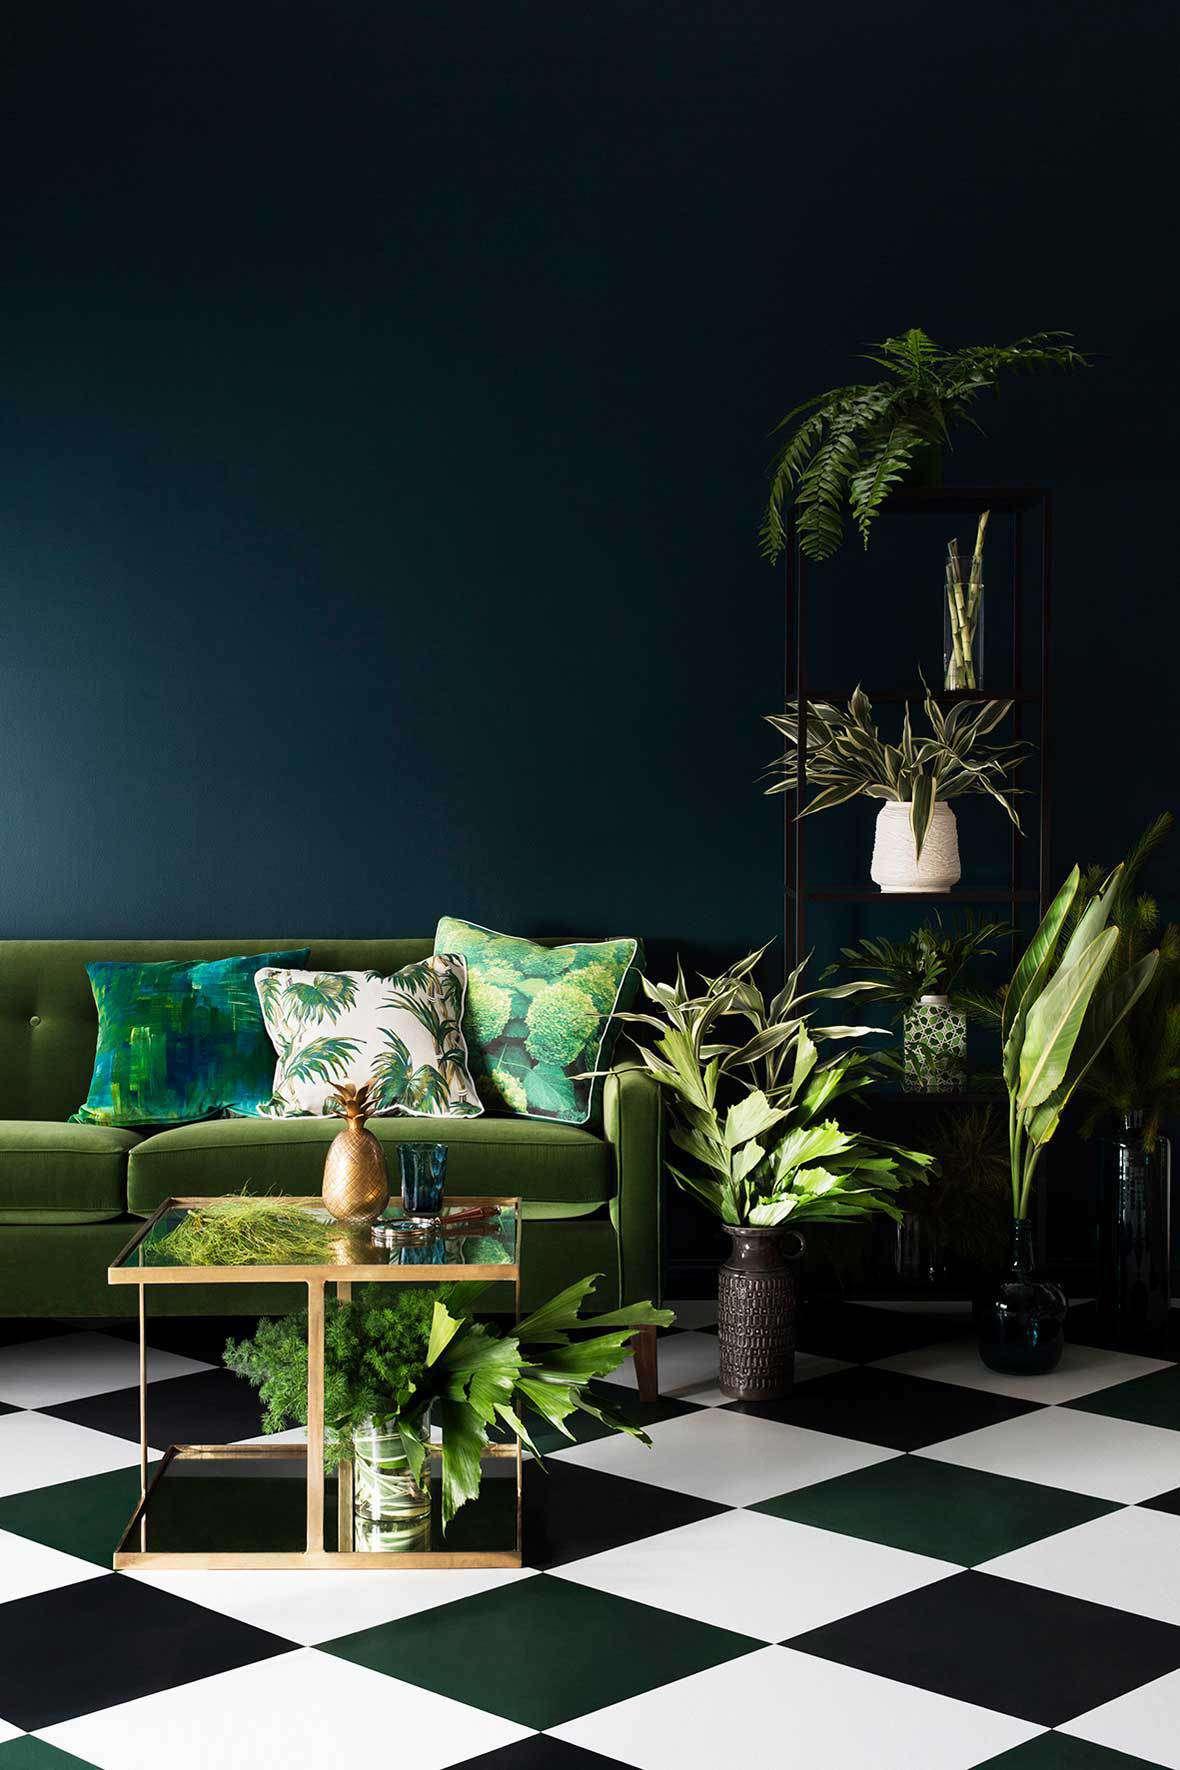 Dark green living space